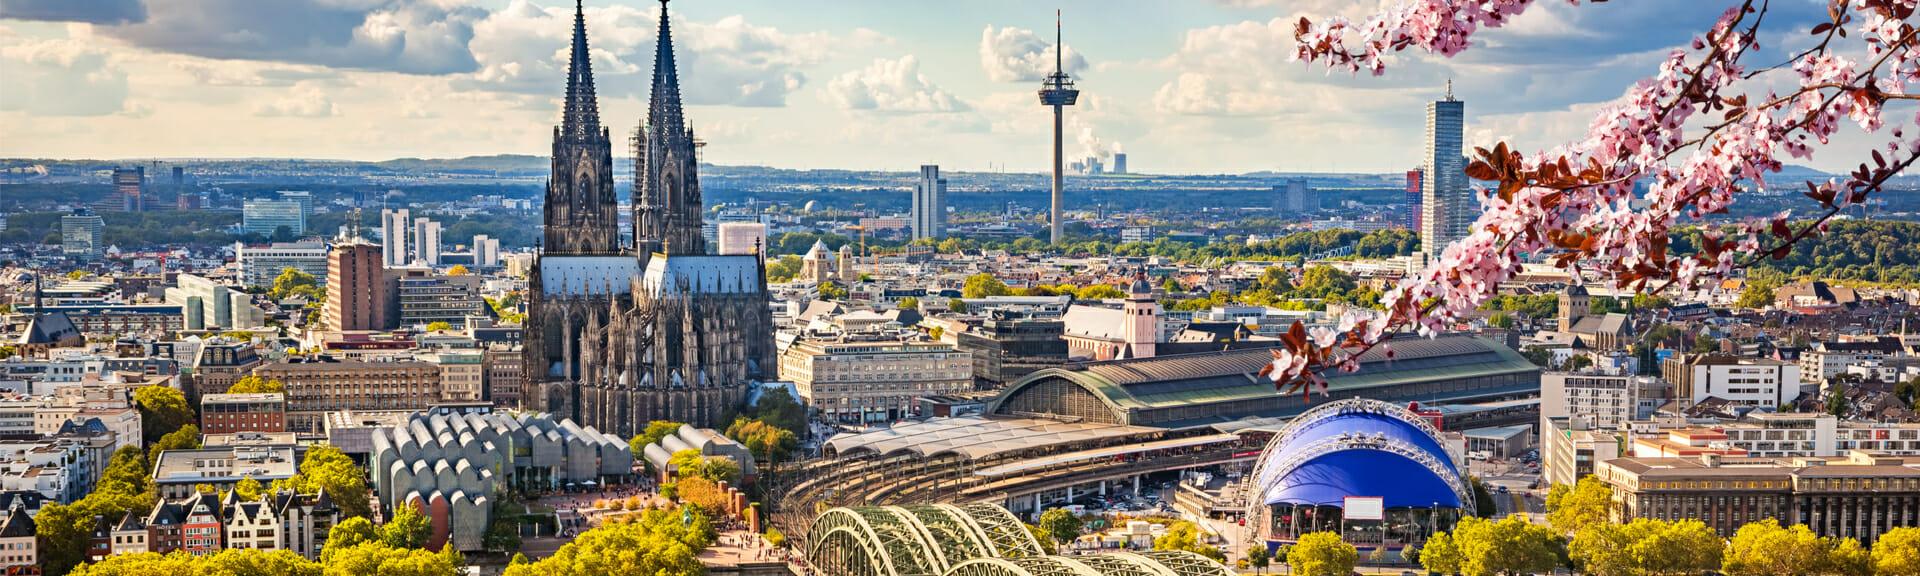 Klassenfahrt Köln Kölner Dom